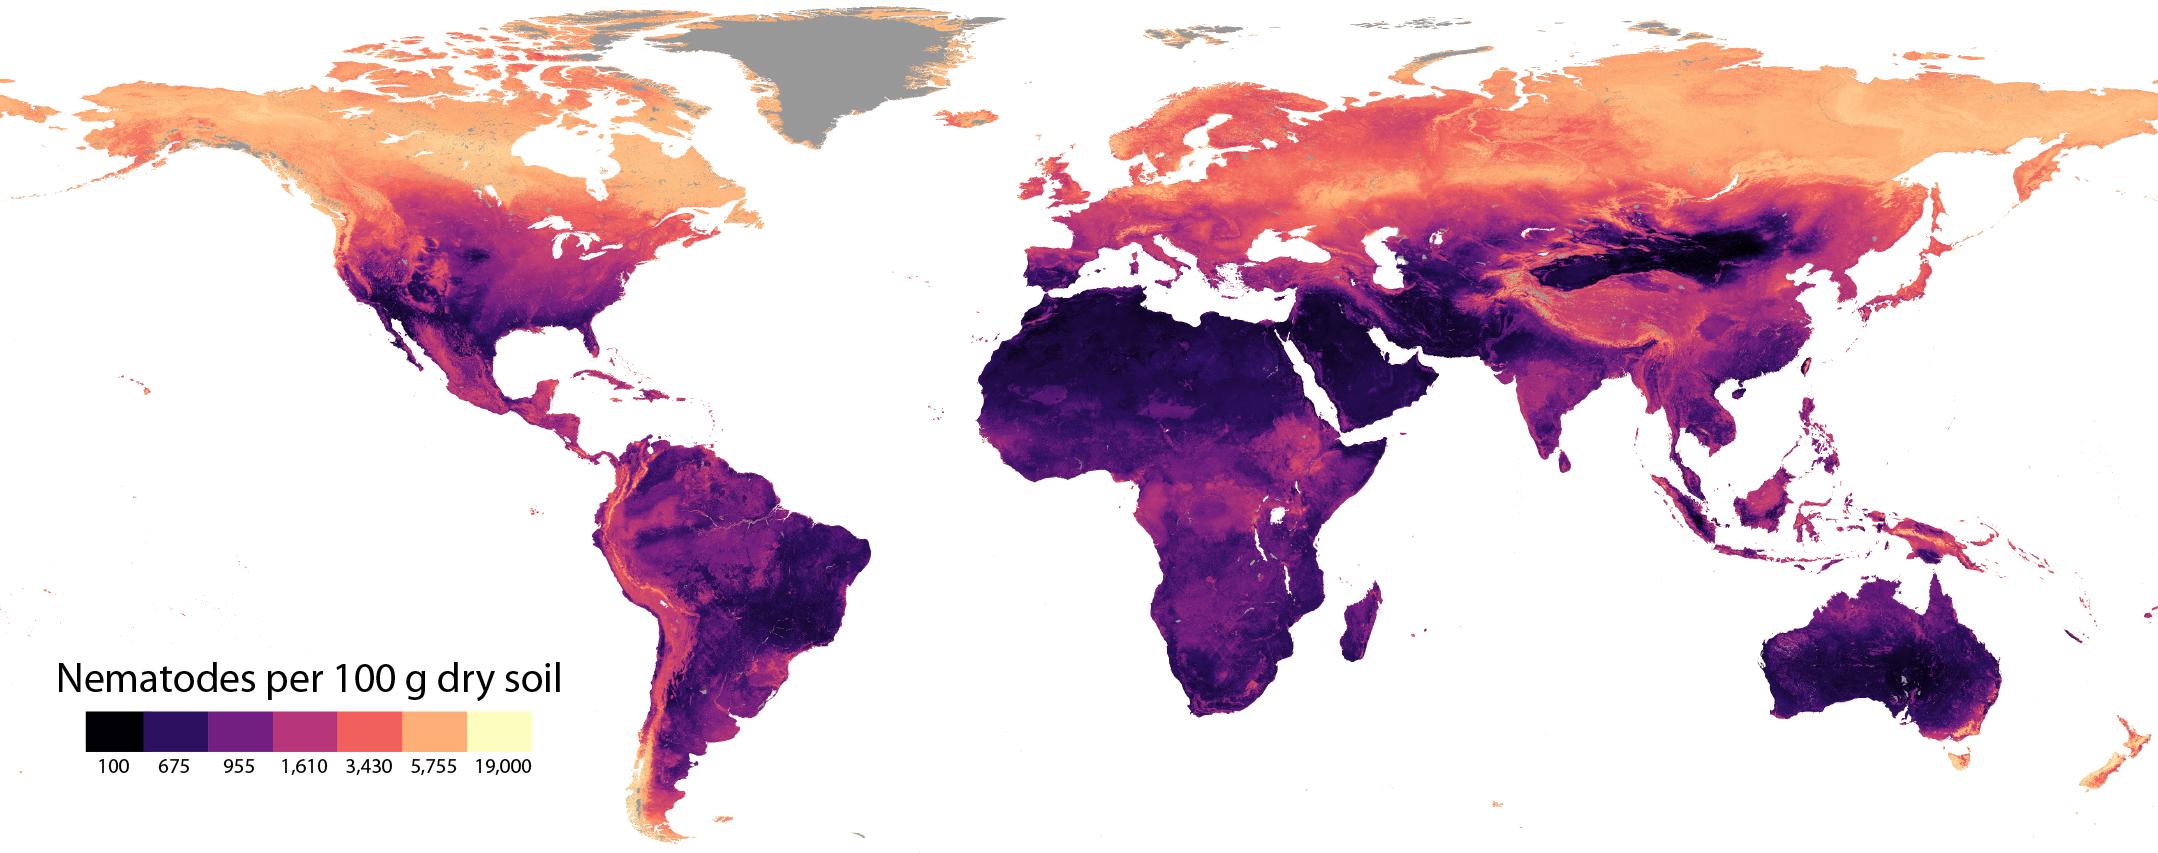 imagen de Distribución global de nematodos por 100 gramos de suelo seco./ CSIC